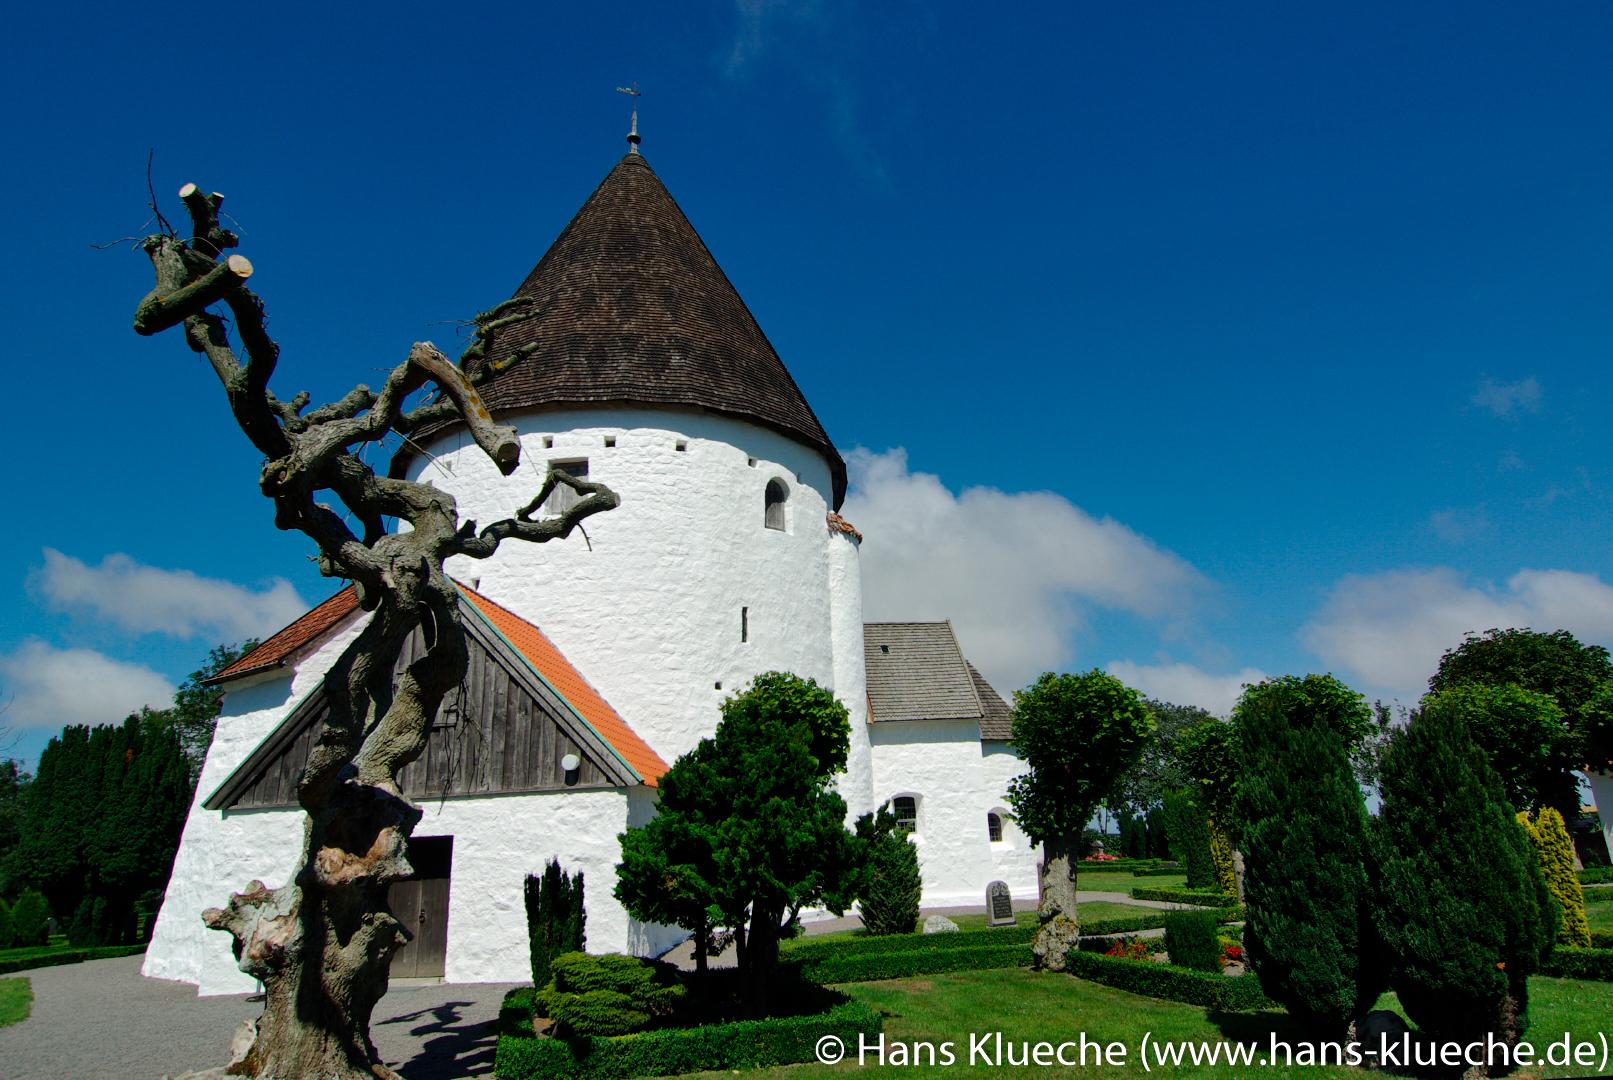 Skt Ols Kirke in Olsker im Norden von Bornholm